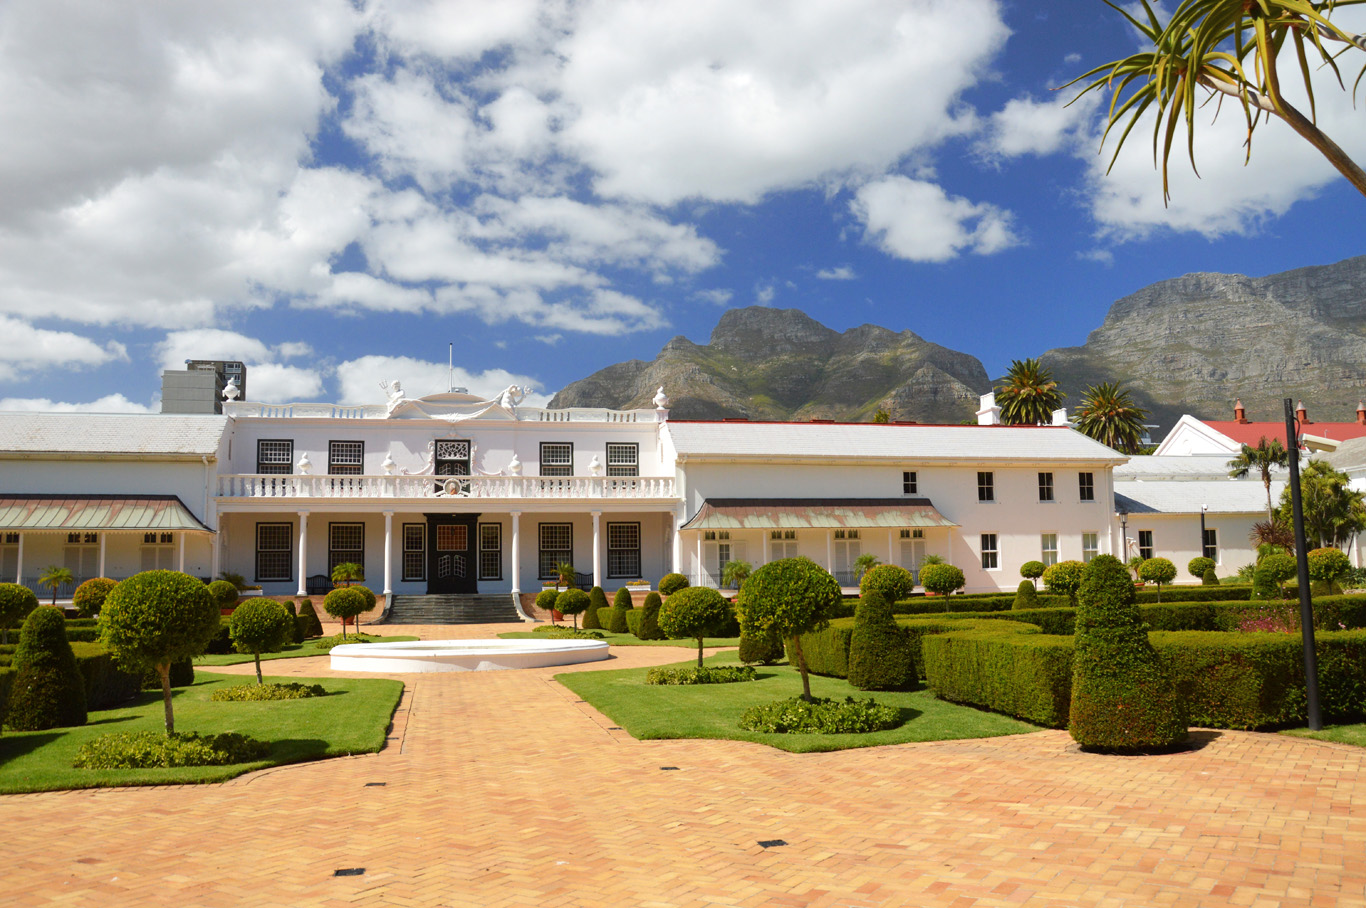 Presidential mansion